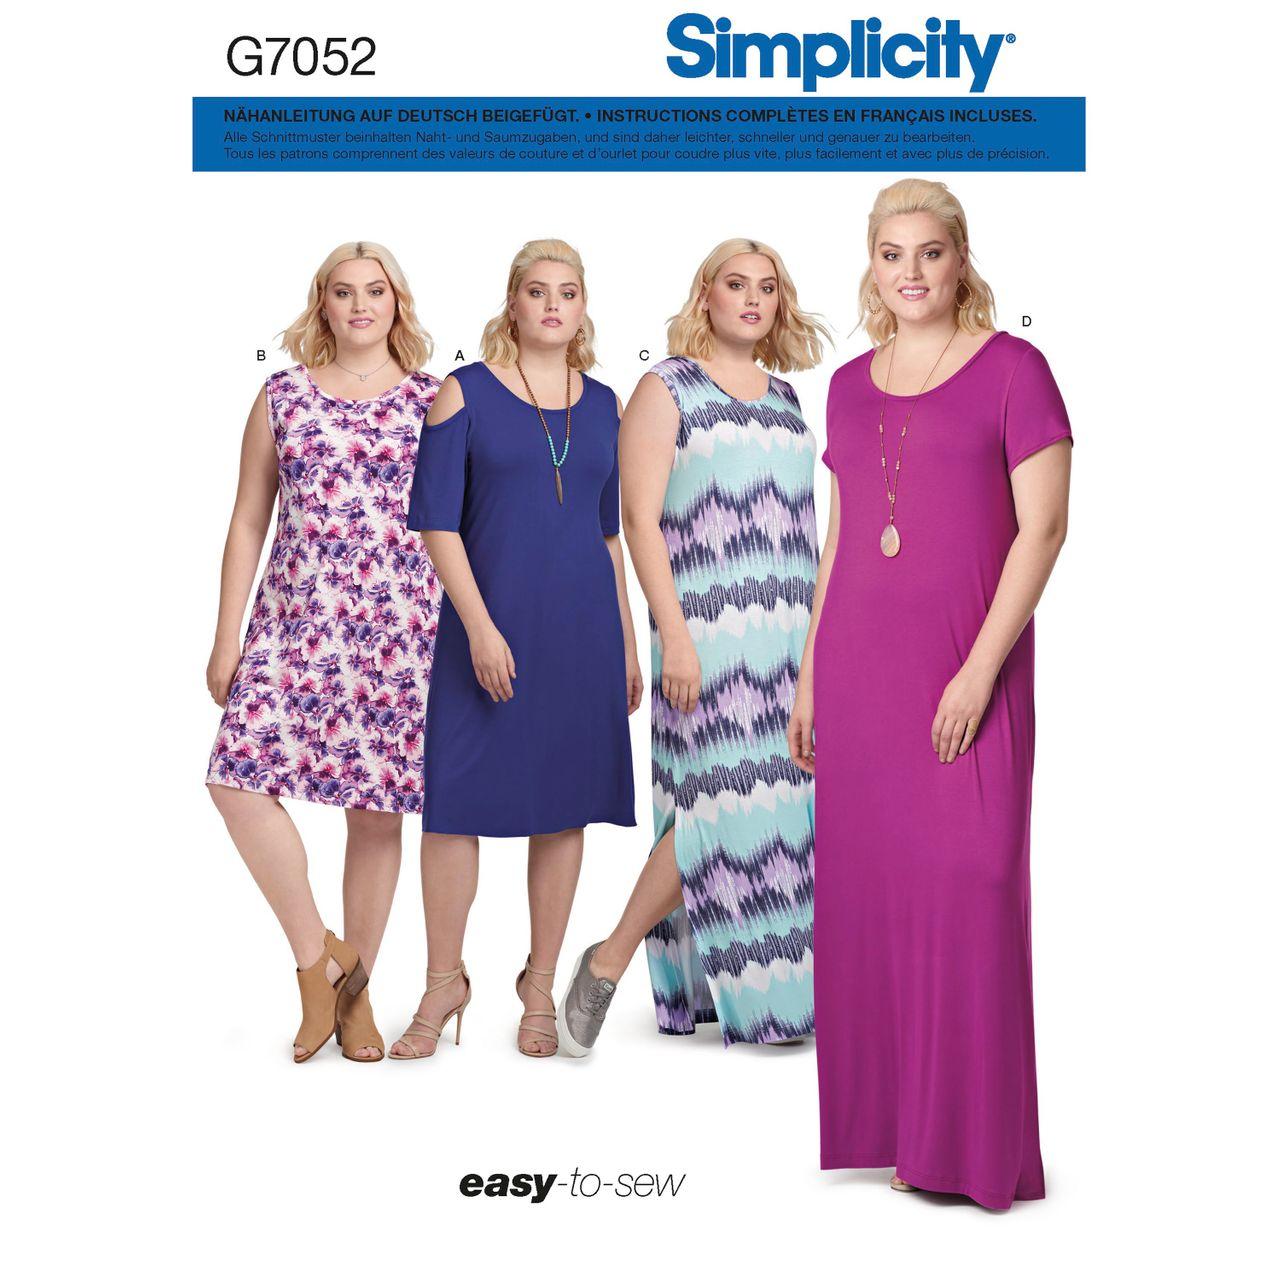 simplicity schnittmuster 7052 - damen kleid in großen größen | alfatex  webshop